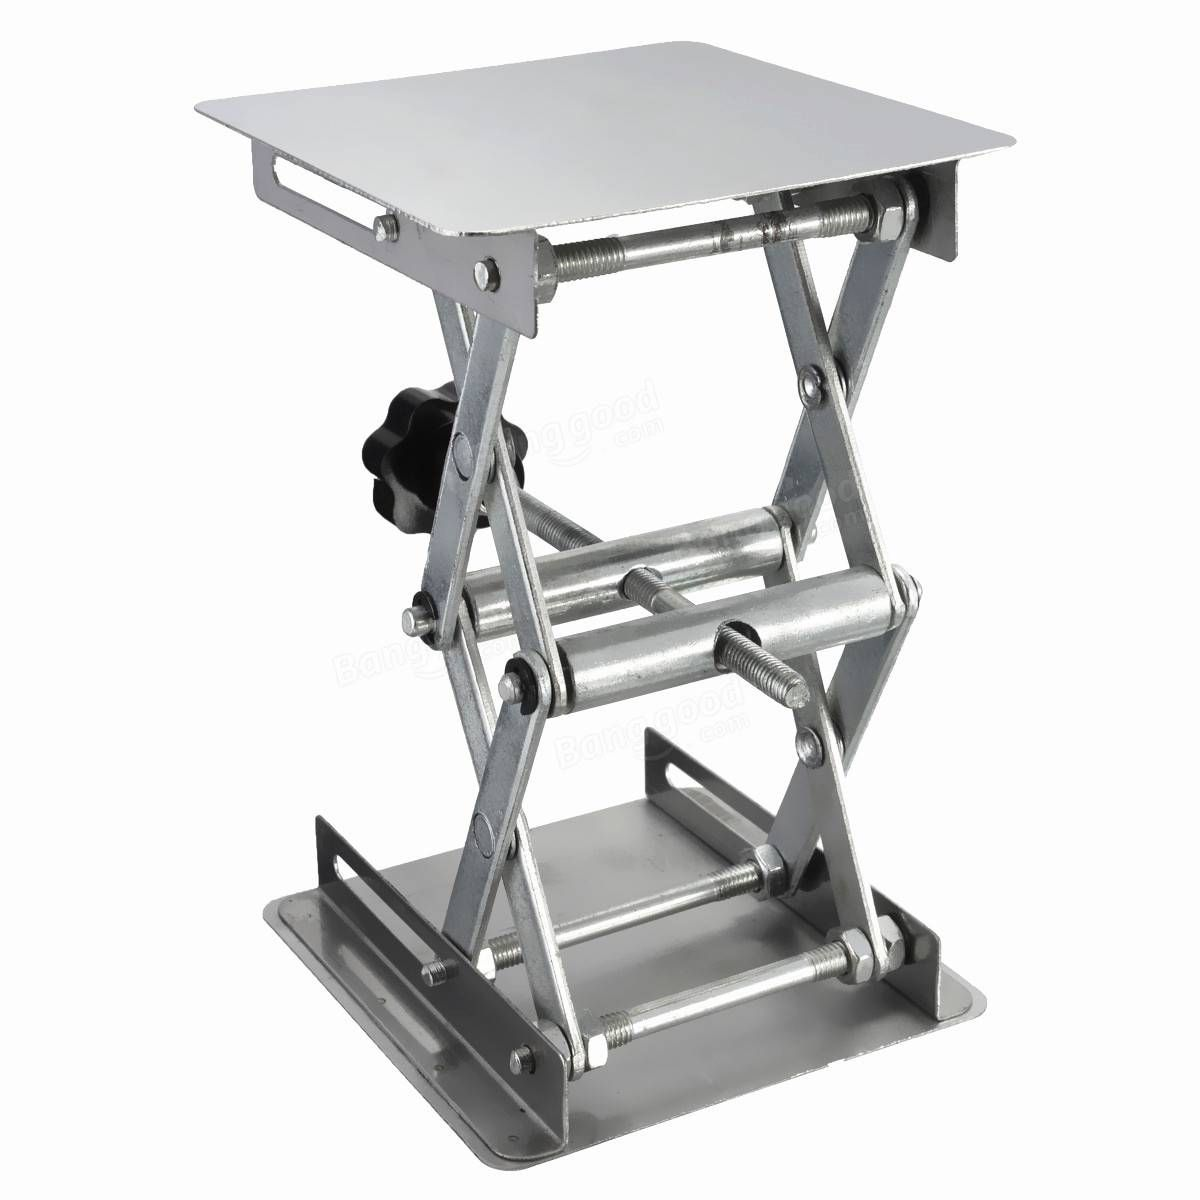 Laboratory lifts platform stand manual control 100x100x150mm lifts laboratory lifts manual control 100x100x150mm sale banggood greentooth Image collections